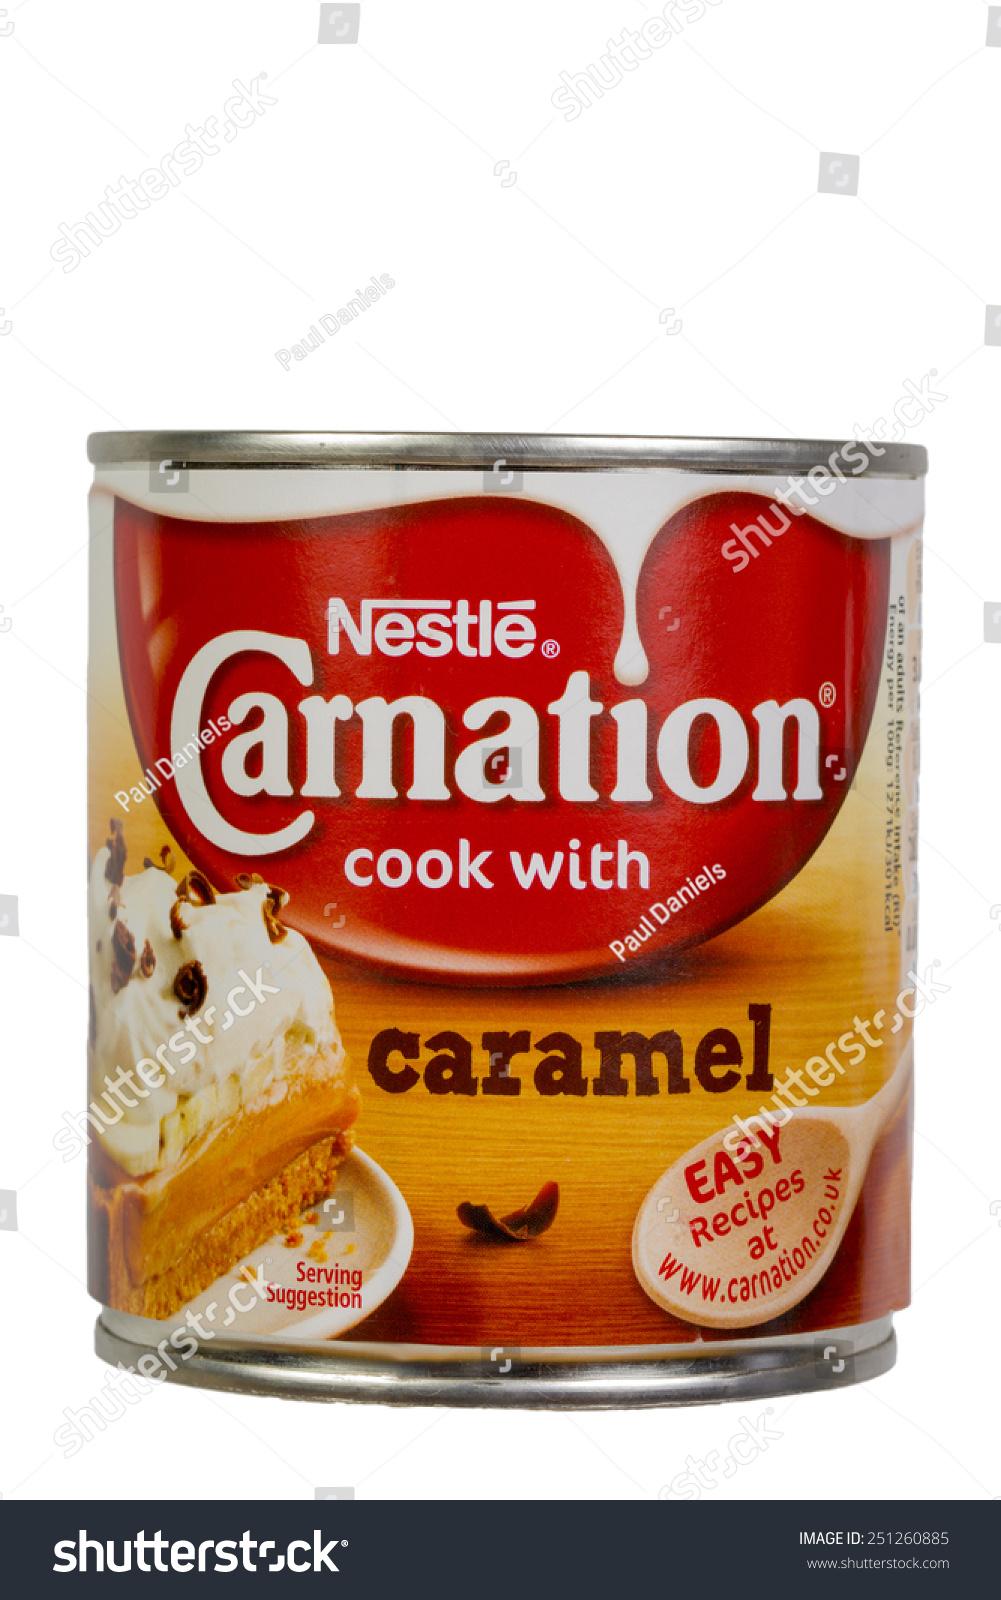 Carnation Caramel Cake Recipes